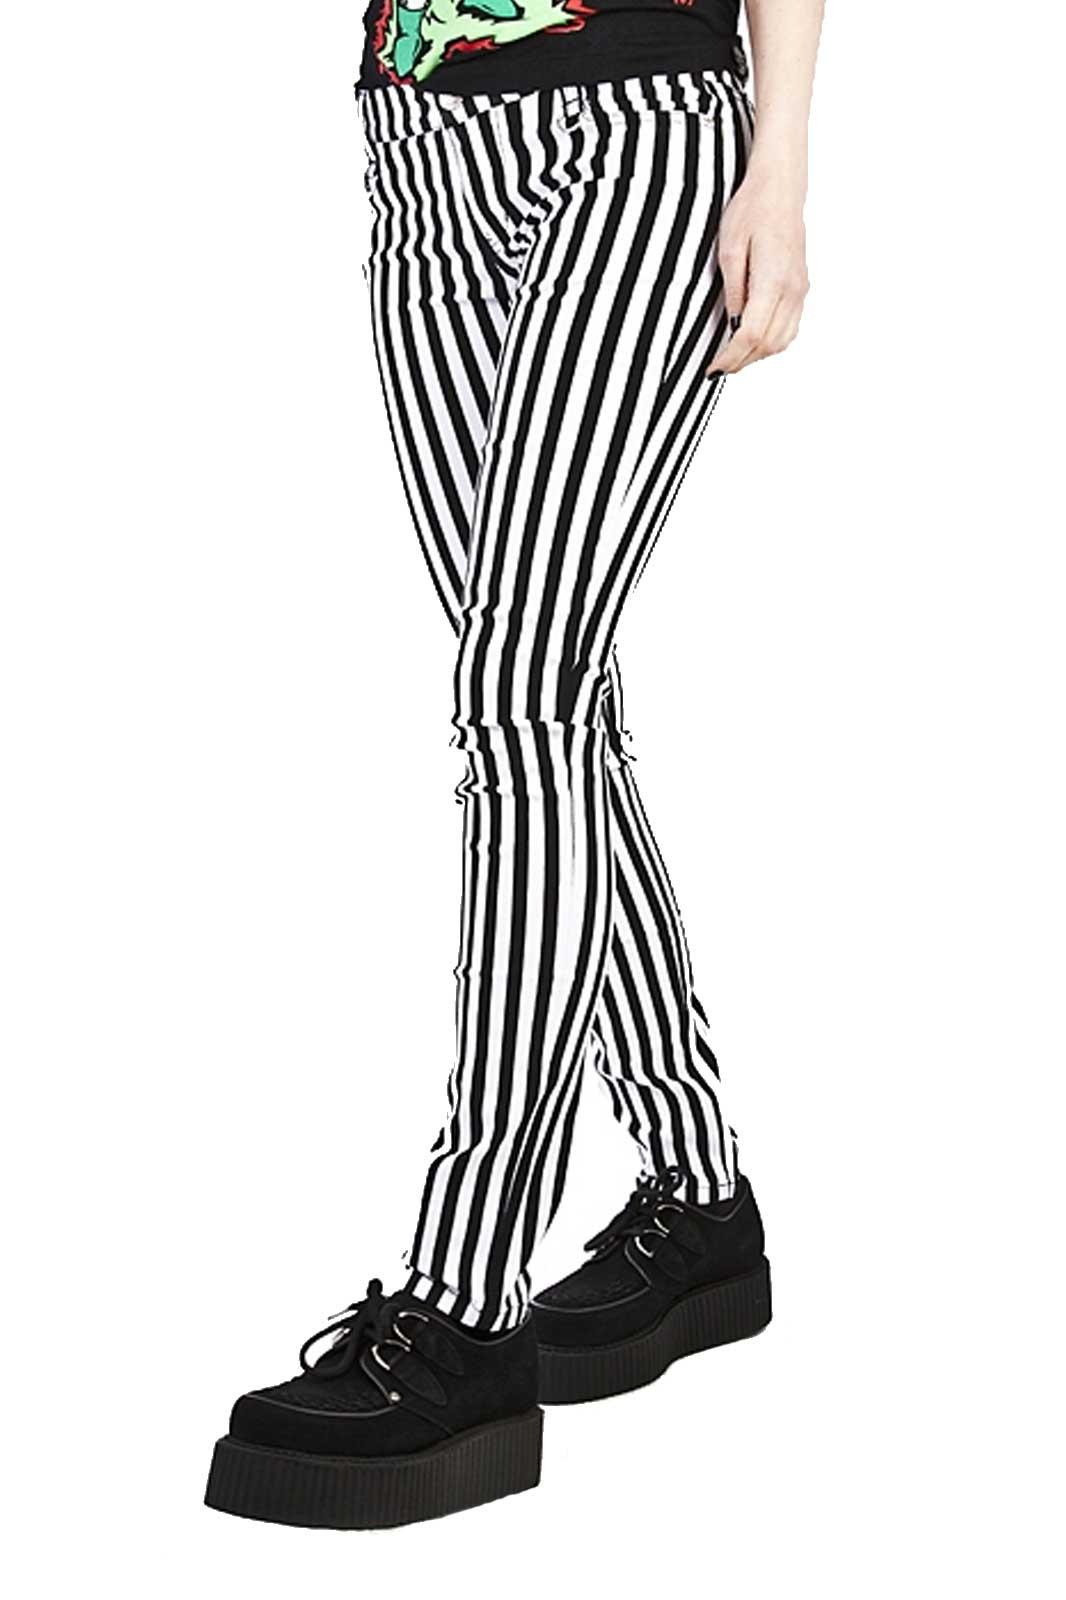 banned apparel clothing stripe skinny jeans black white